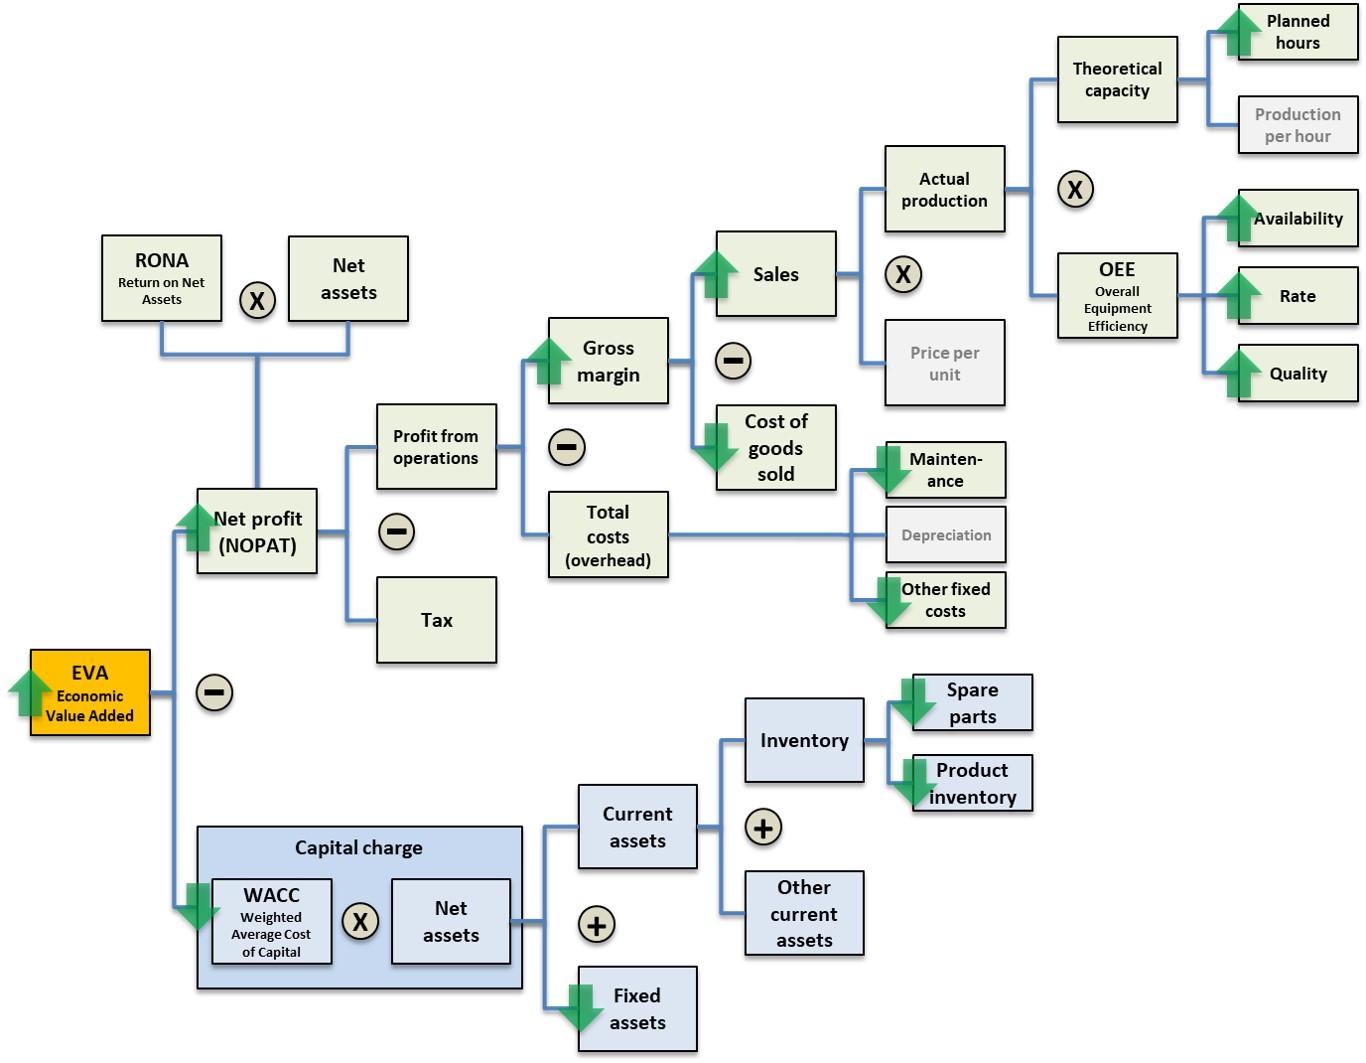 EVA flow chart